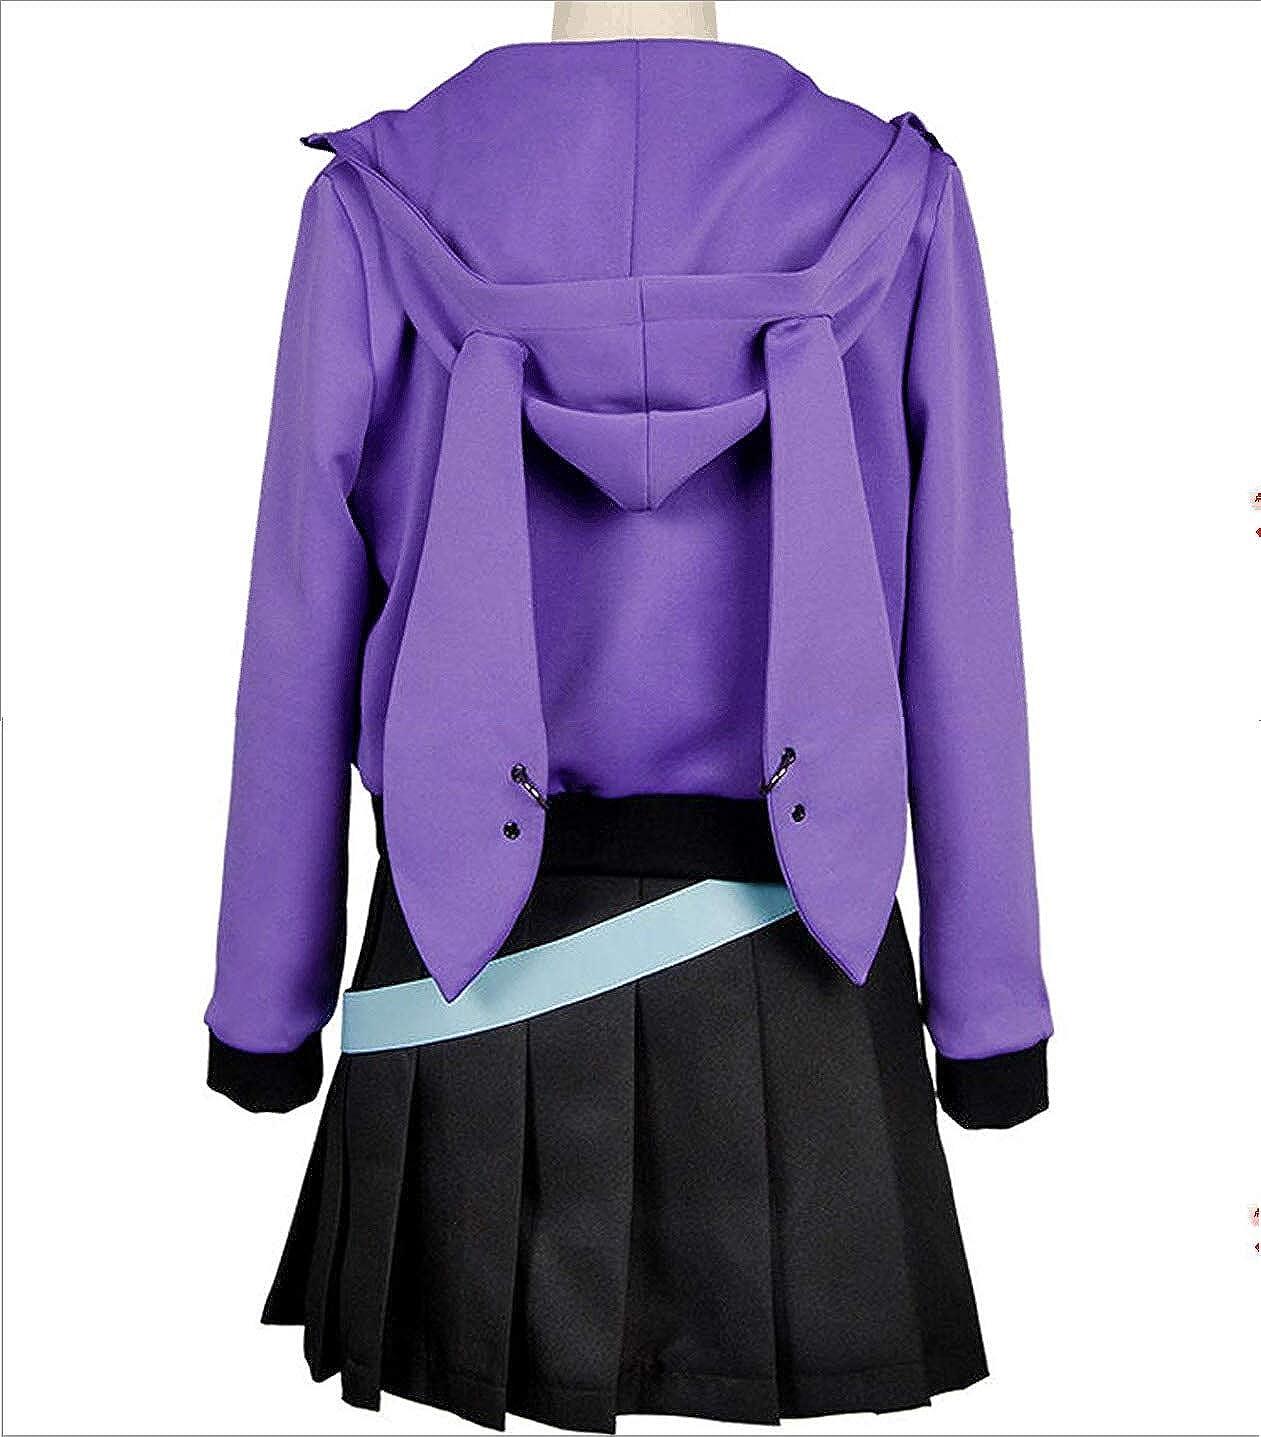 Fate/Apocrypha Fa Rider Astolfo Dress Cosplay Costume